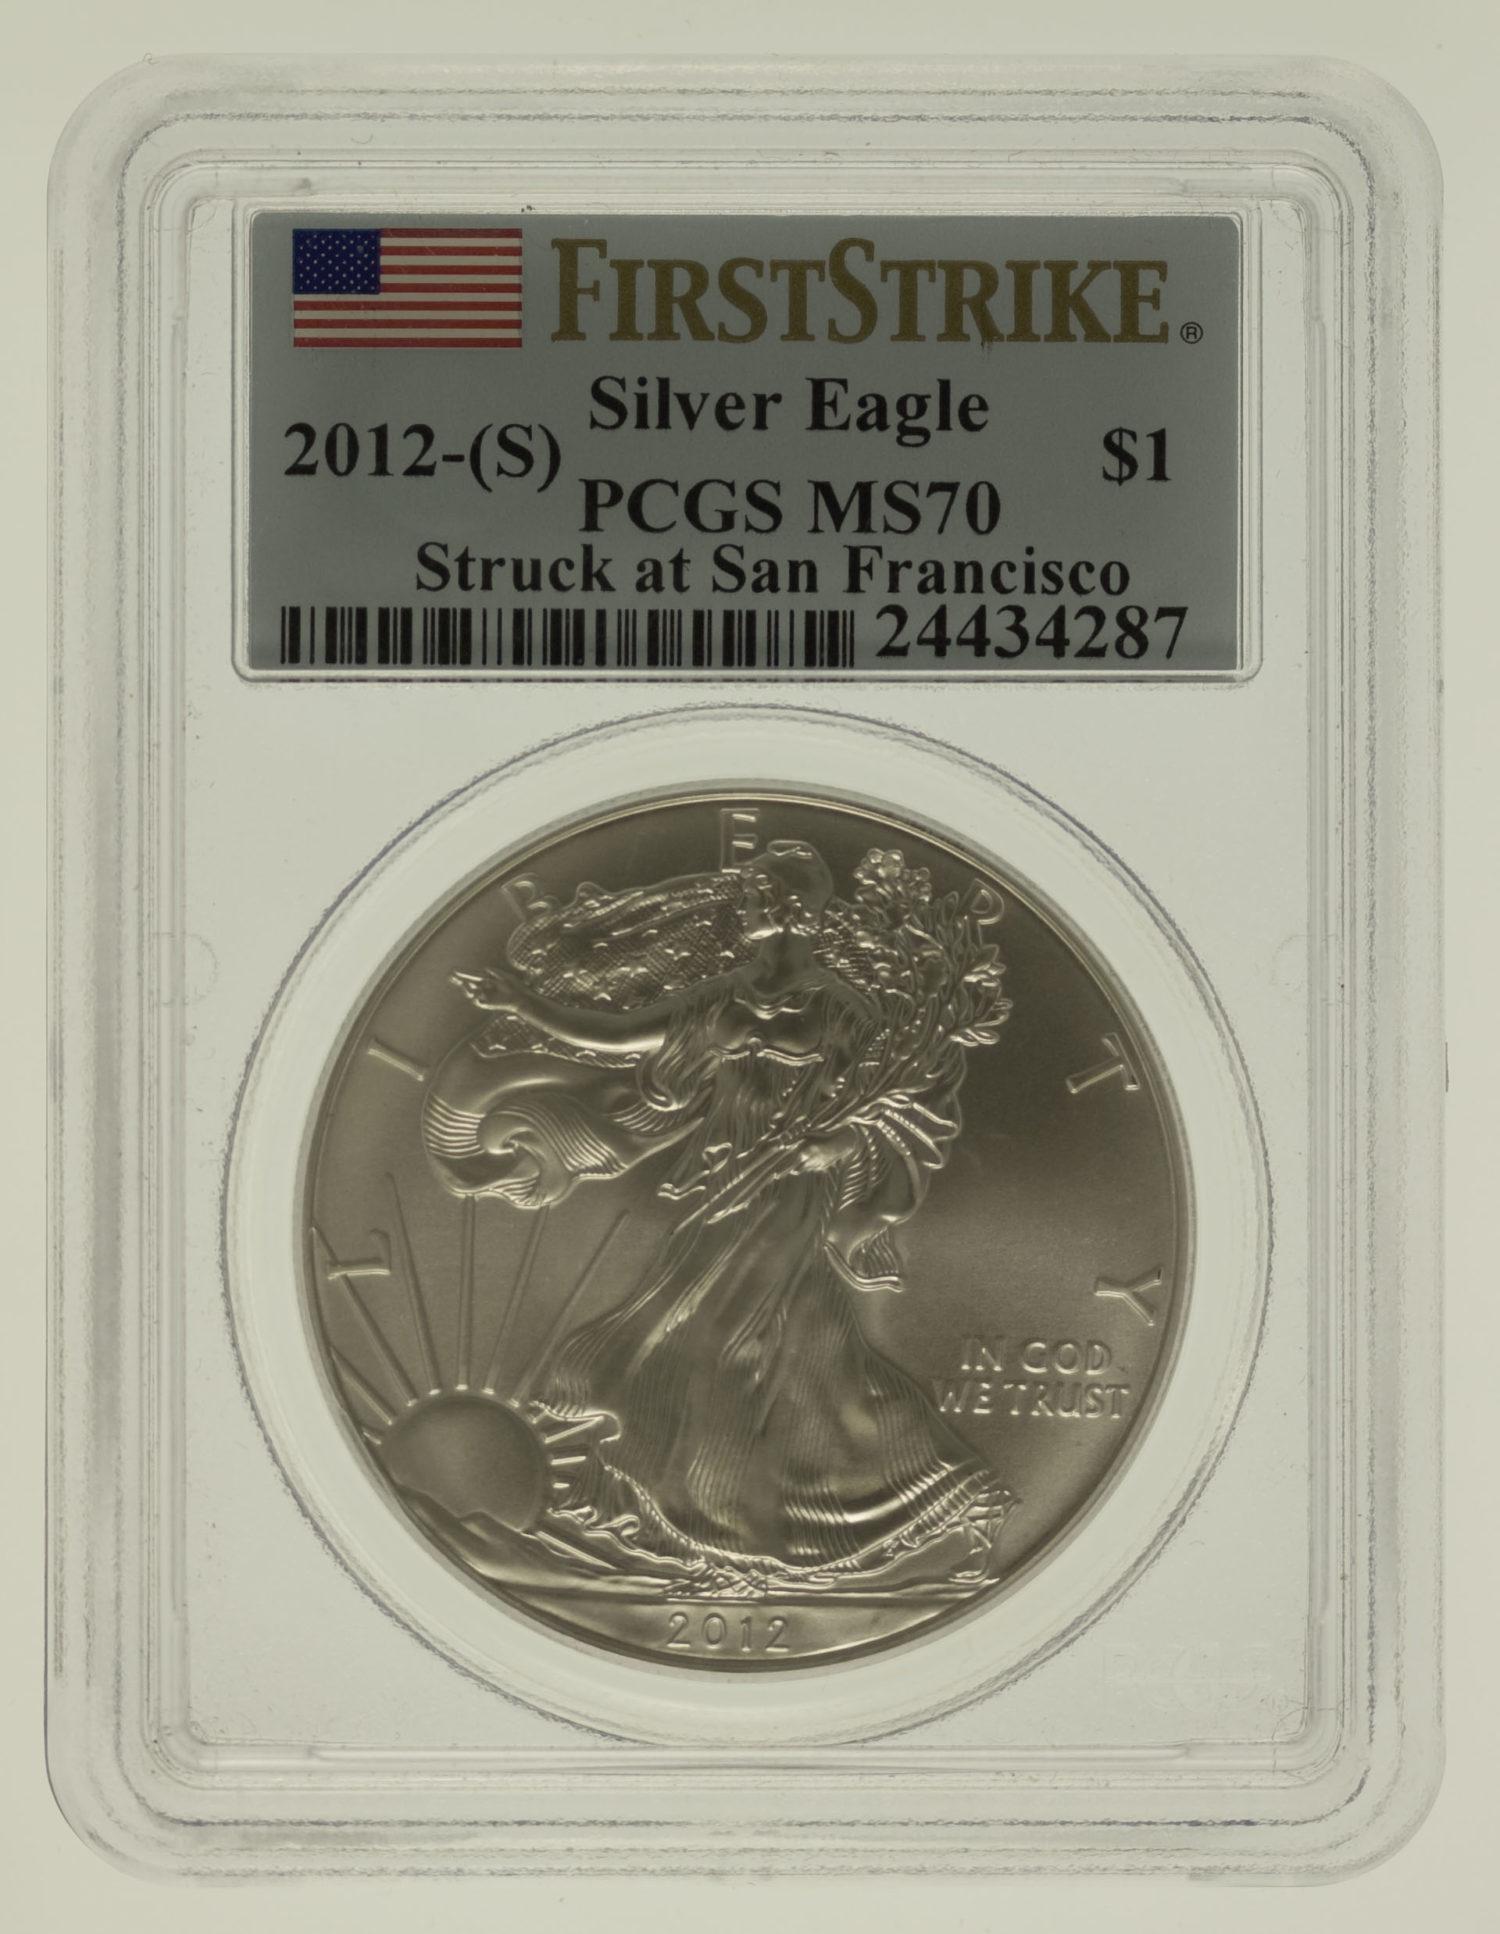 usa-silbermuenzen-uebrige-welt - USA Dollar 2012 American Eagle